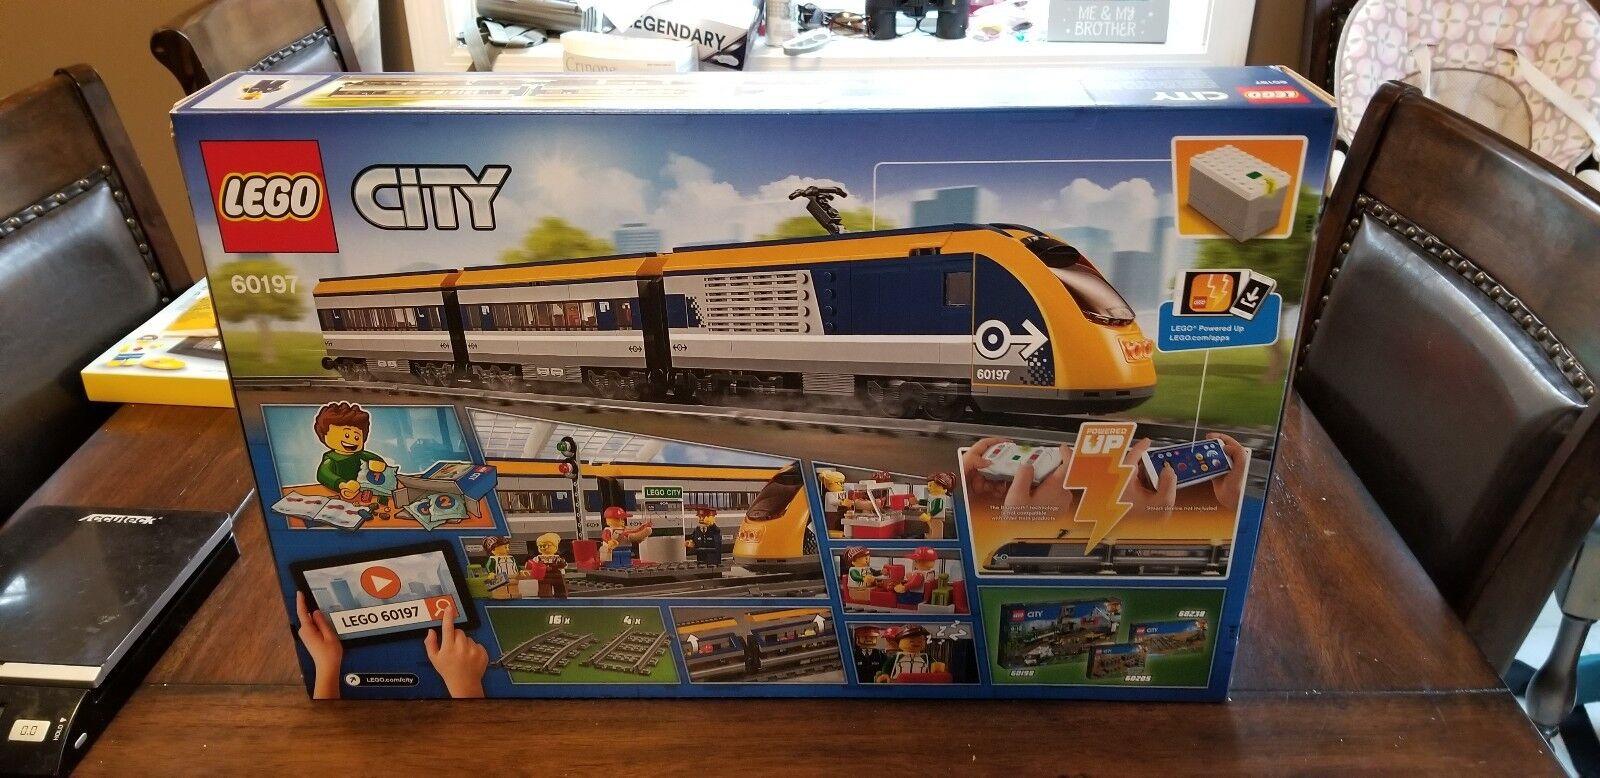 Lego City Set  60197 Passenger Train - Brand New and mint